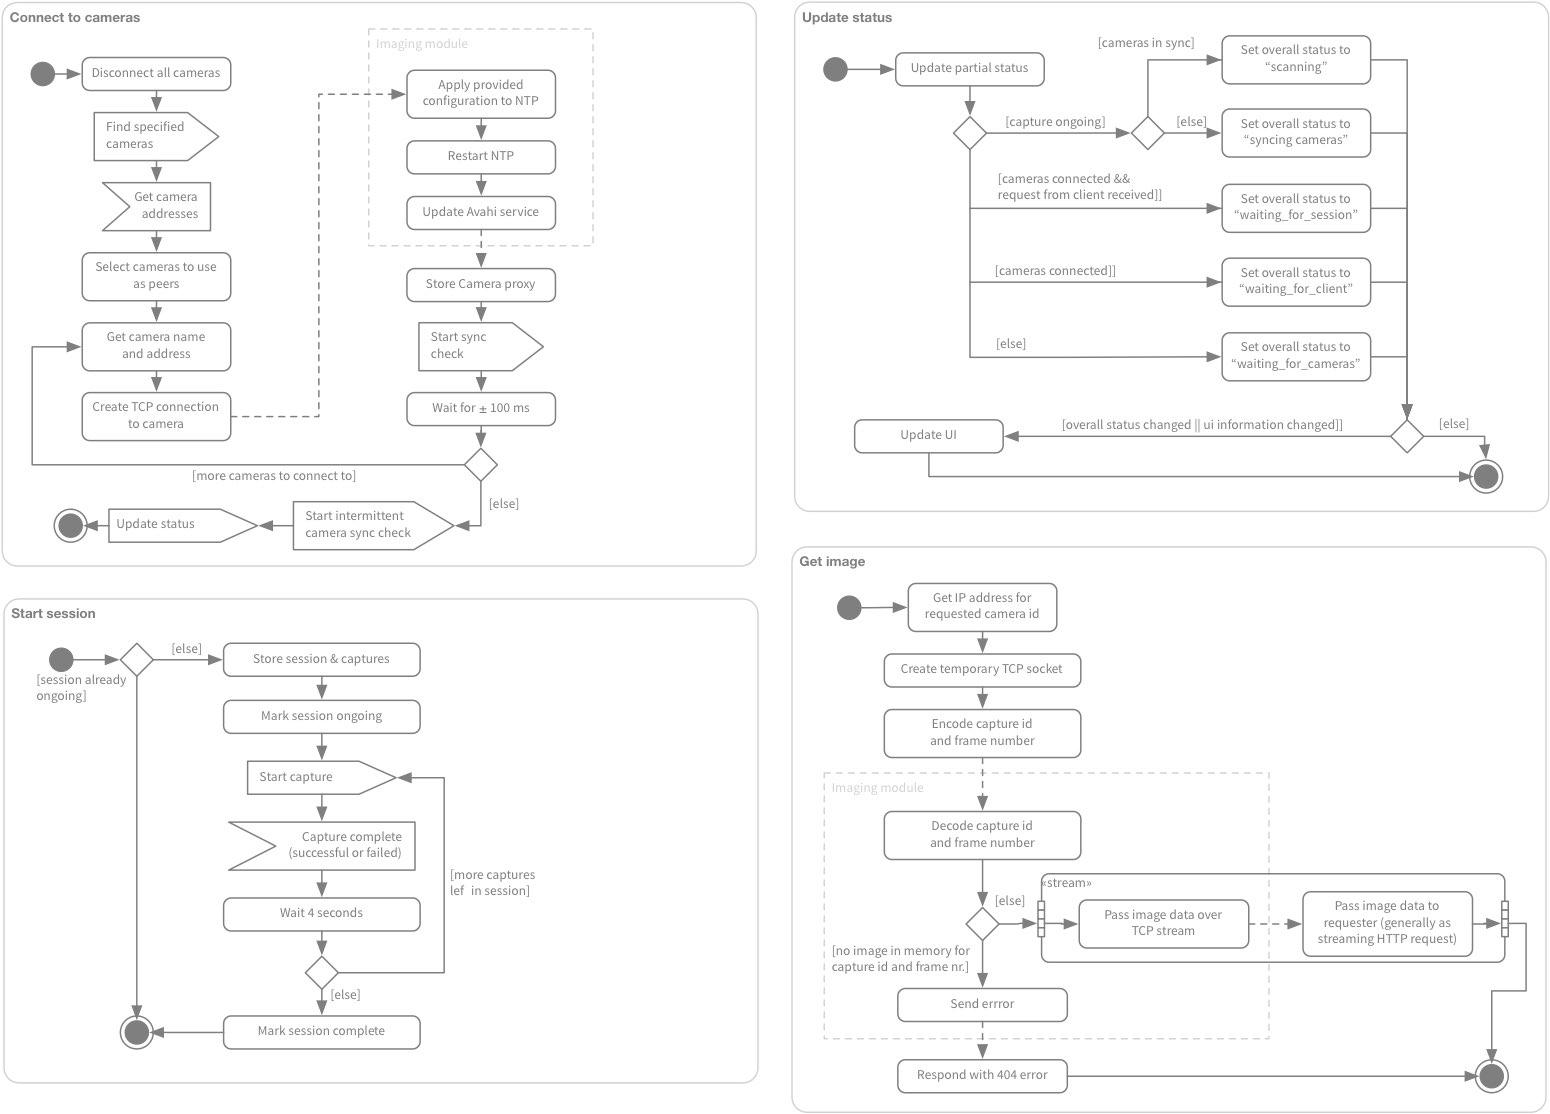 Partial UMD diagram of scanner software